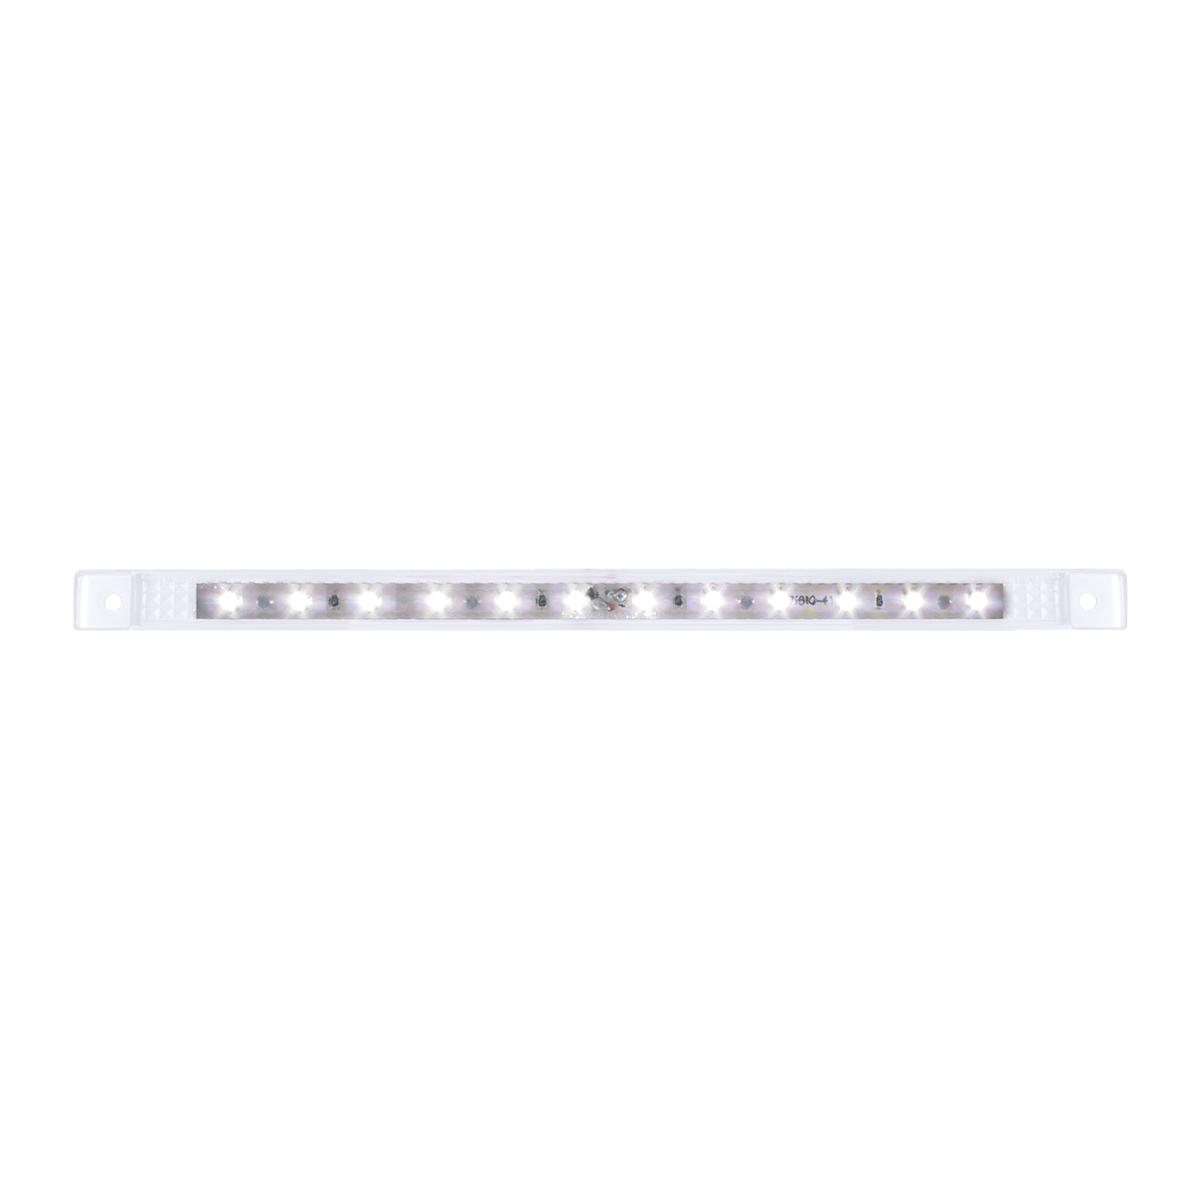 "75966 10-1/8"" Ultra Thin LED Marker Light"